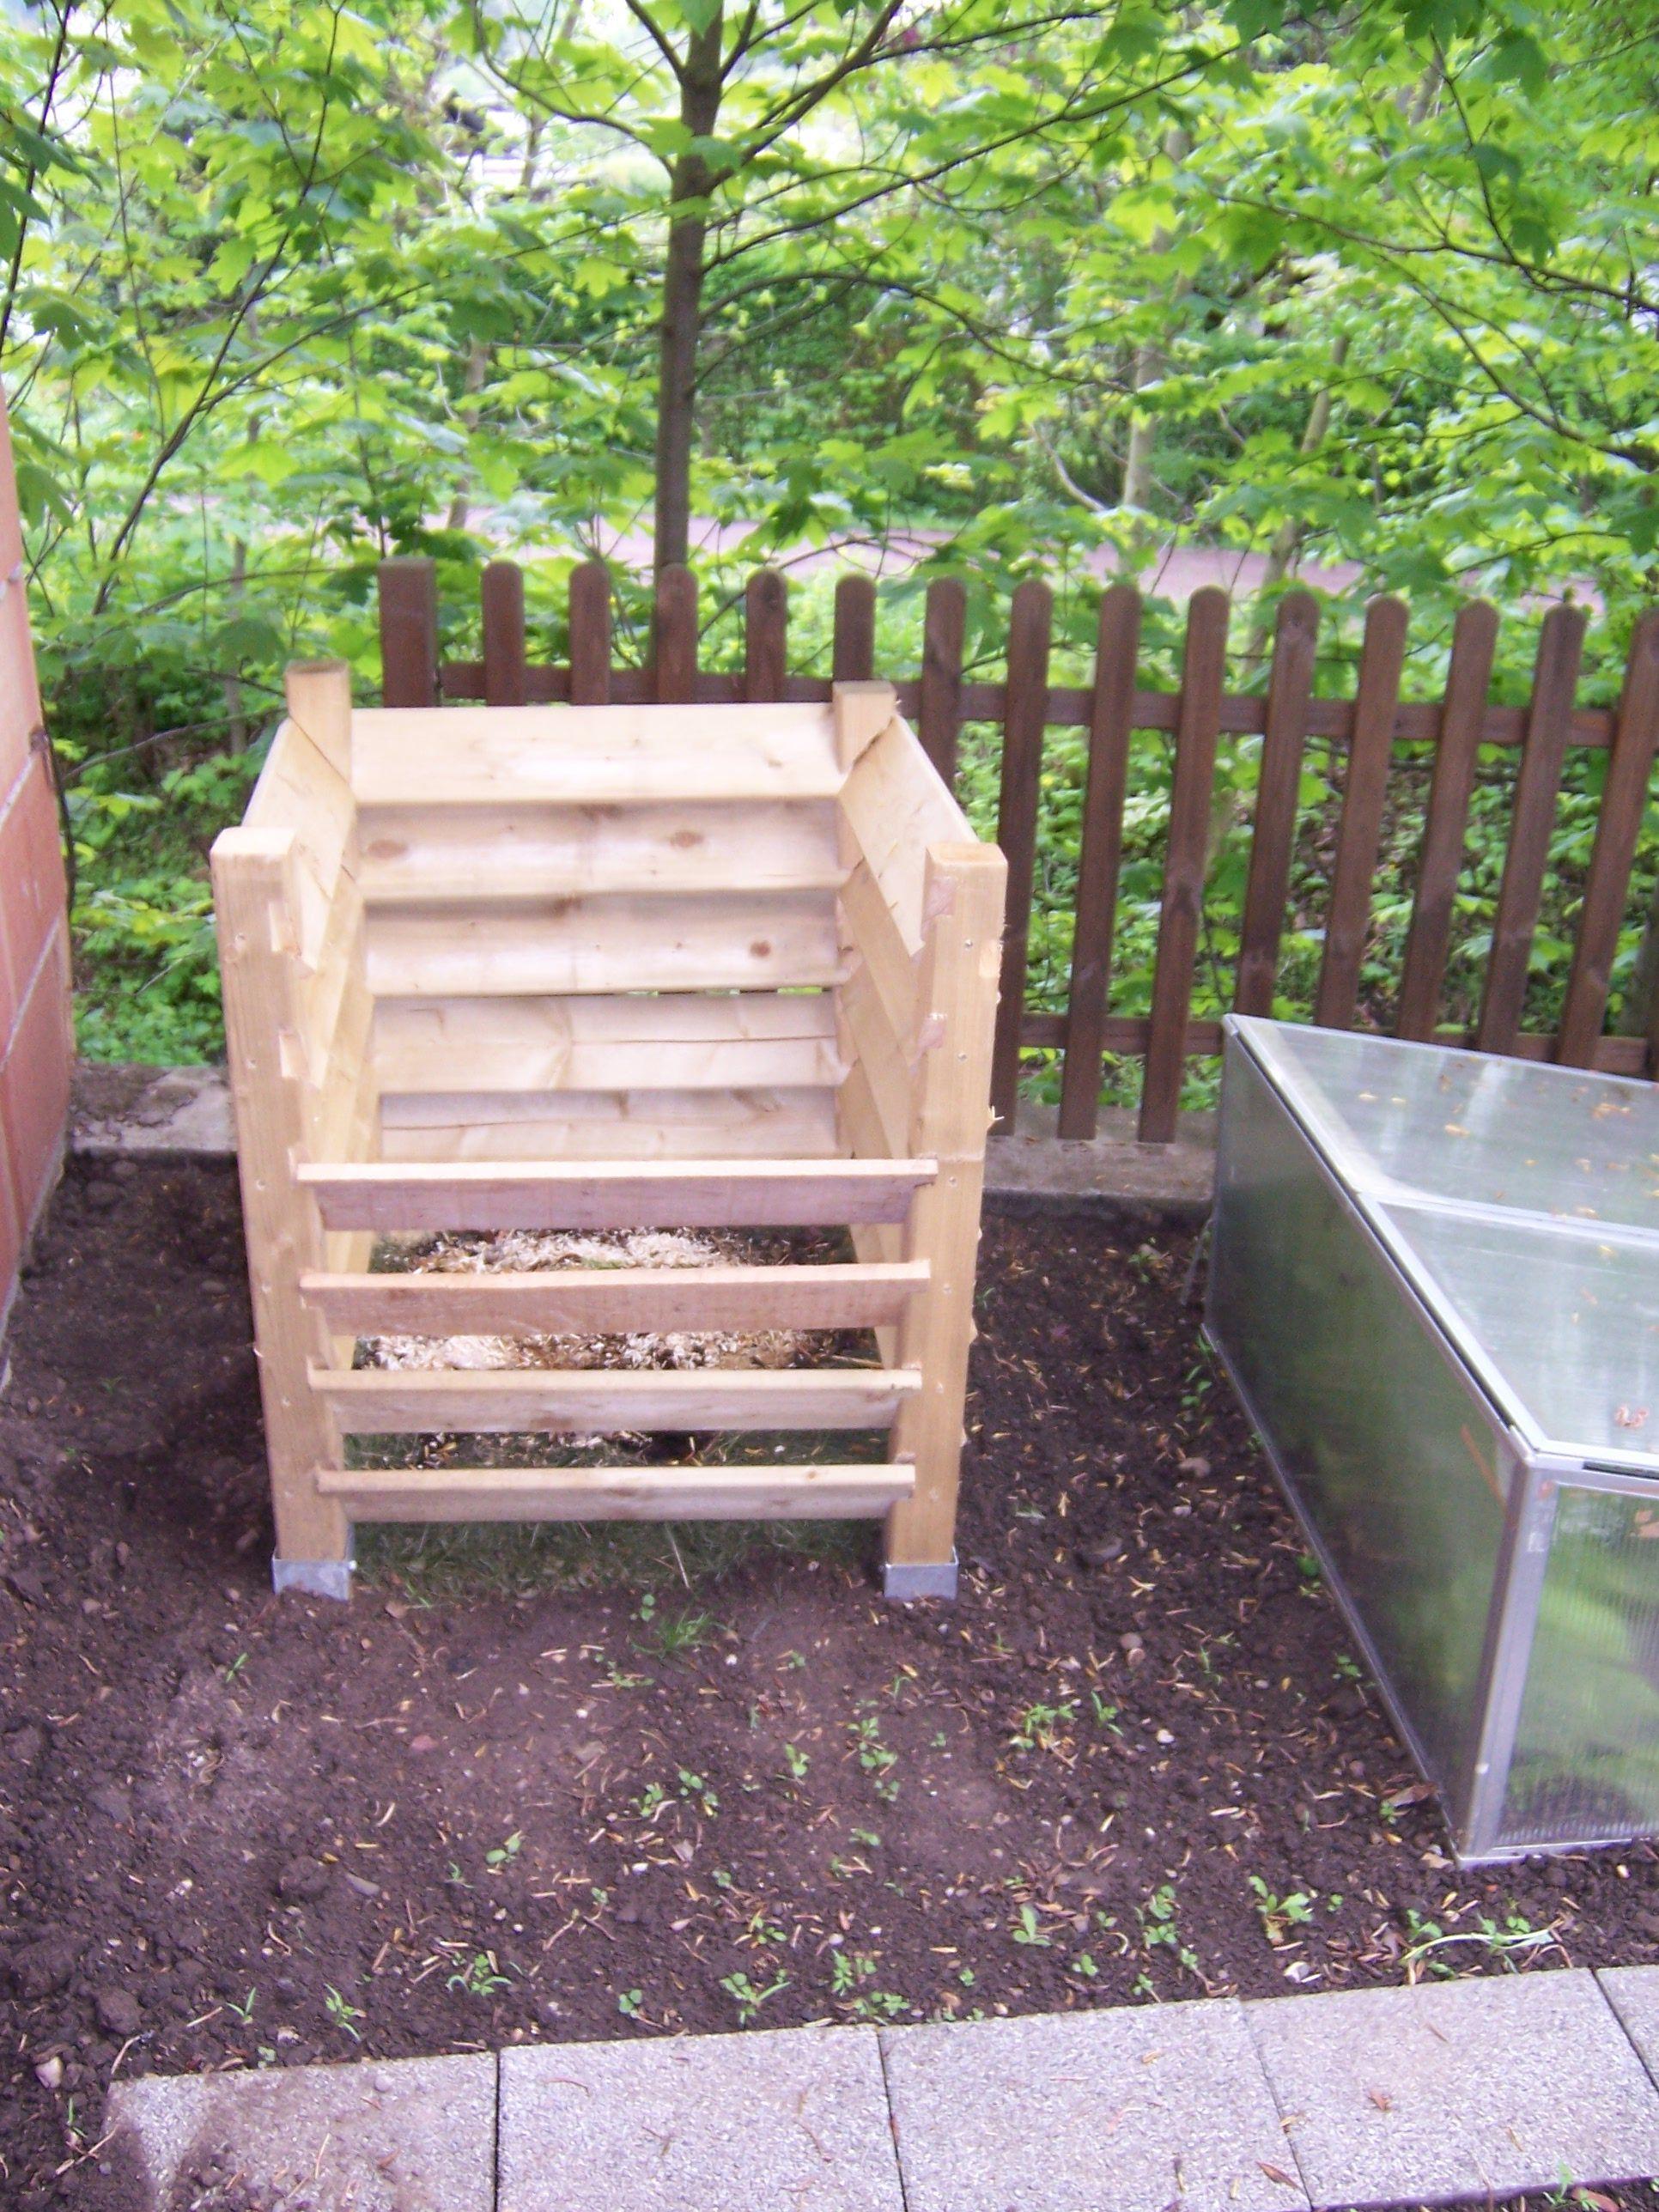 Kompost bauen Kompost, Komposter bauen, Gärtnerei